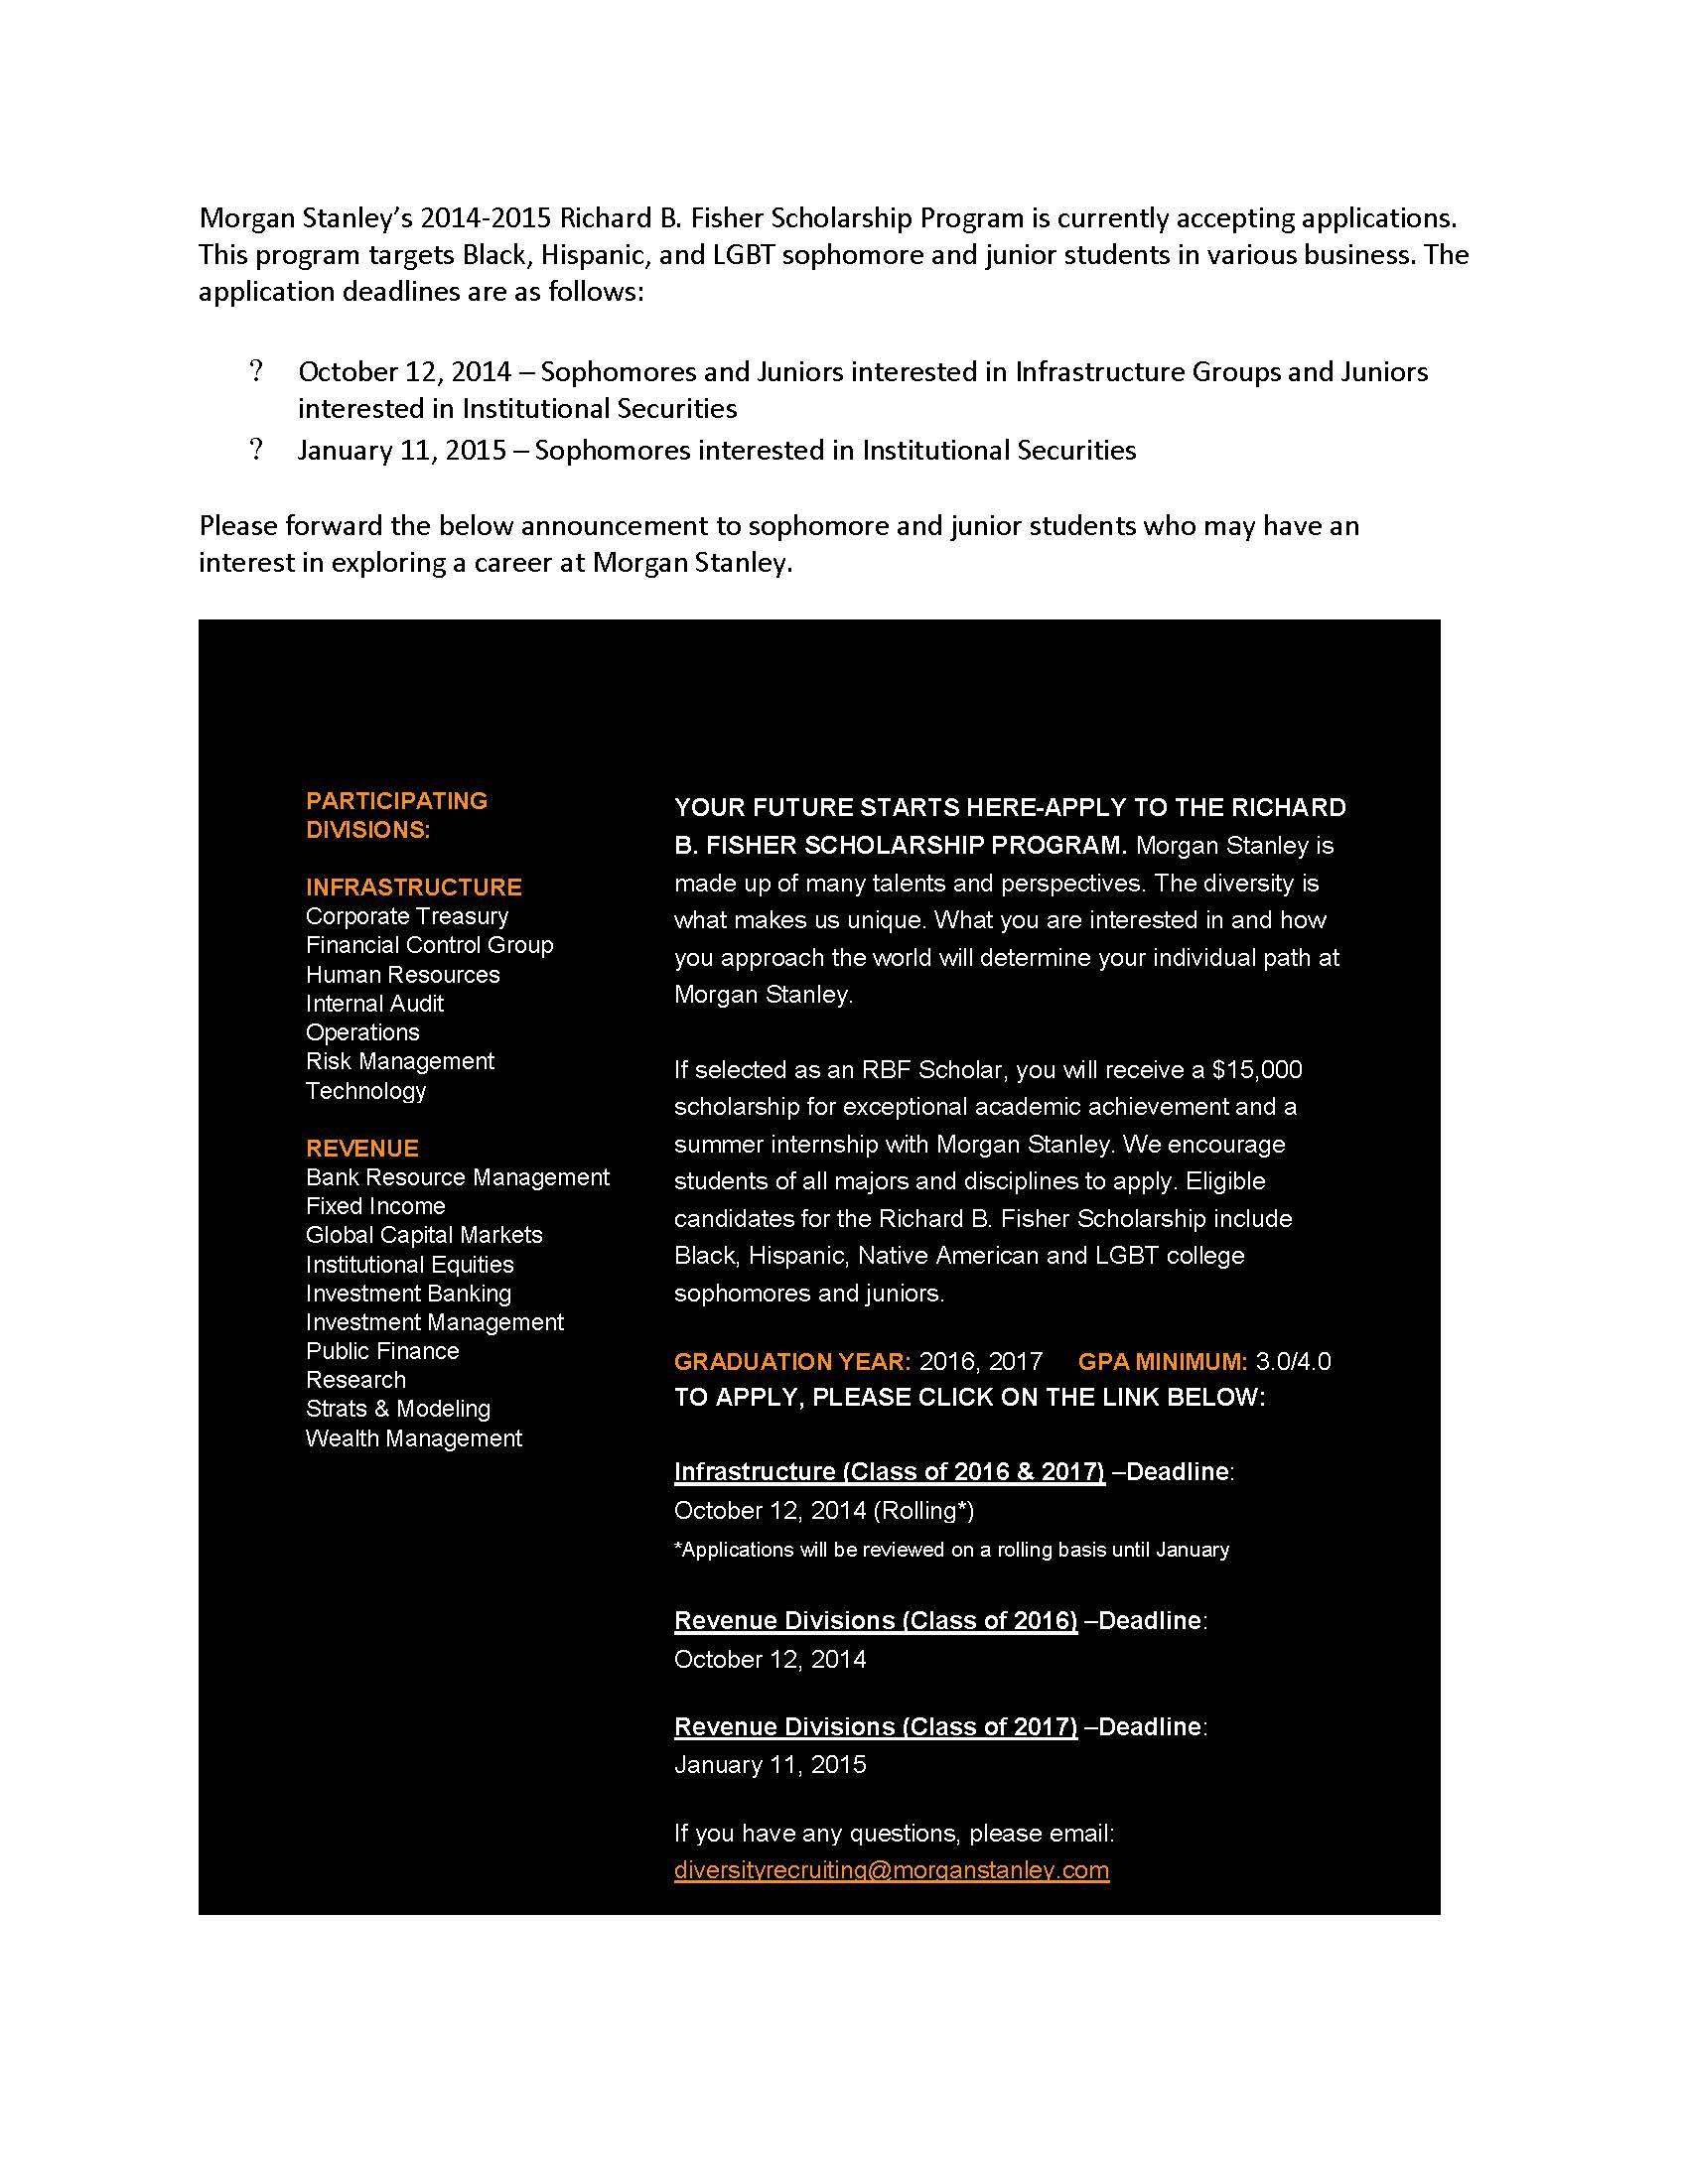 Morgan Stanley Scholarship Program Application Deadlines